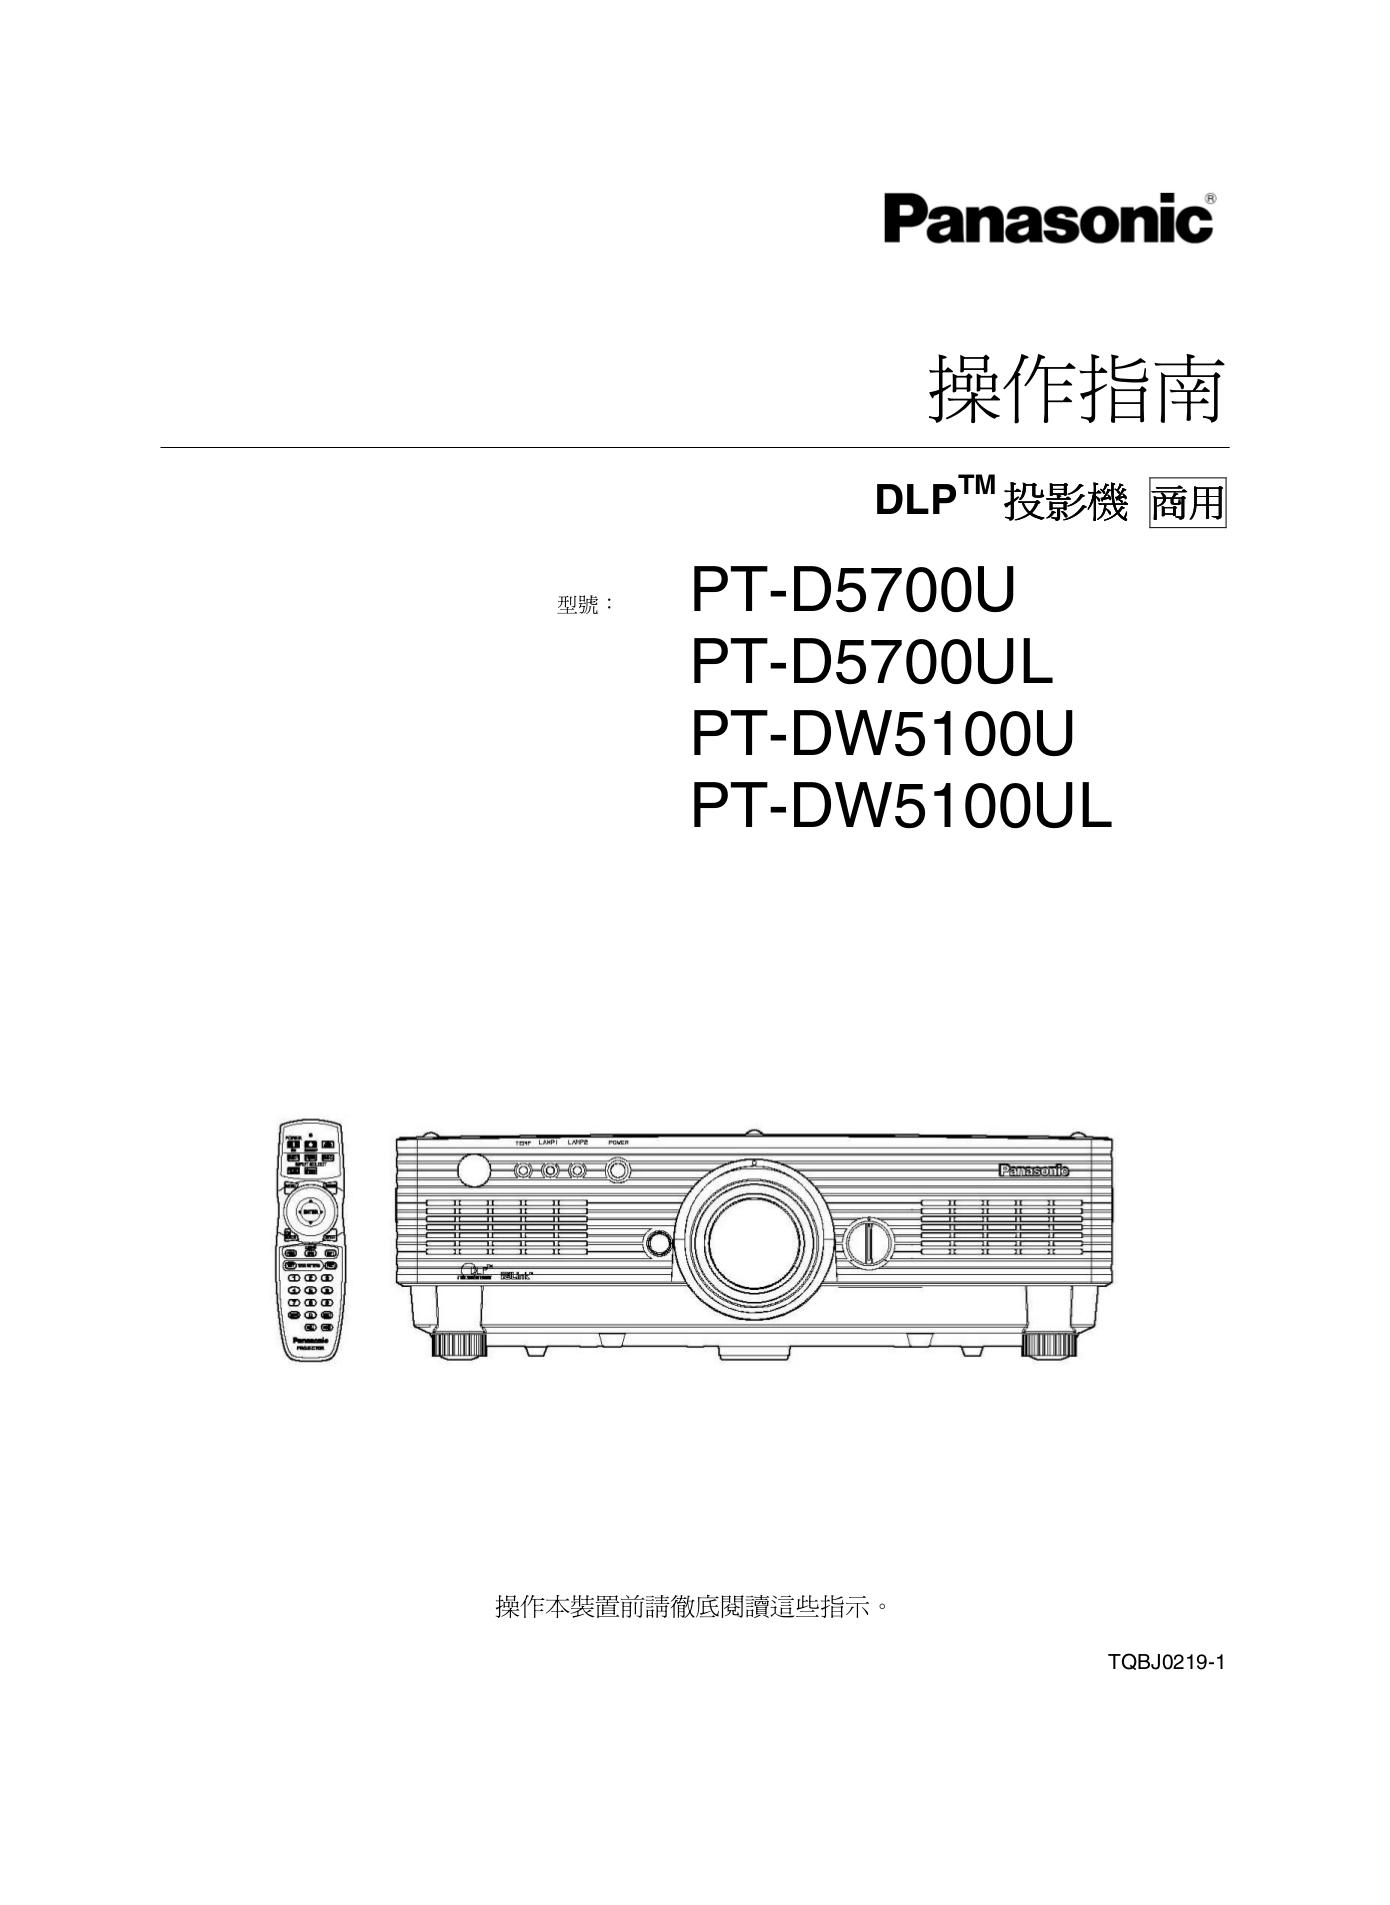 pdf for Panasonic Projector PT-DW5100UL manual